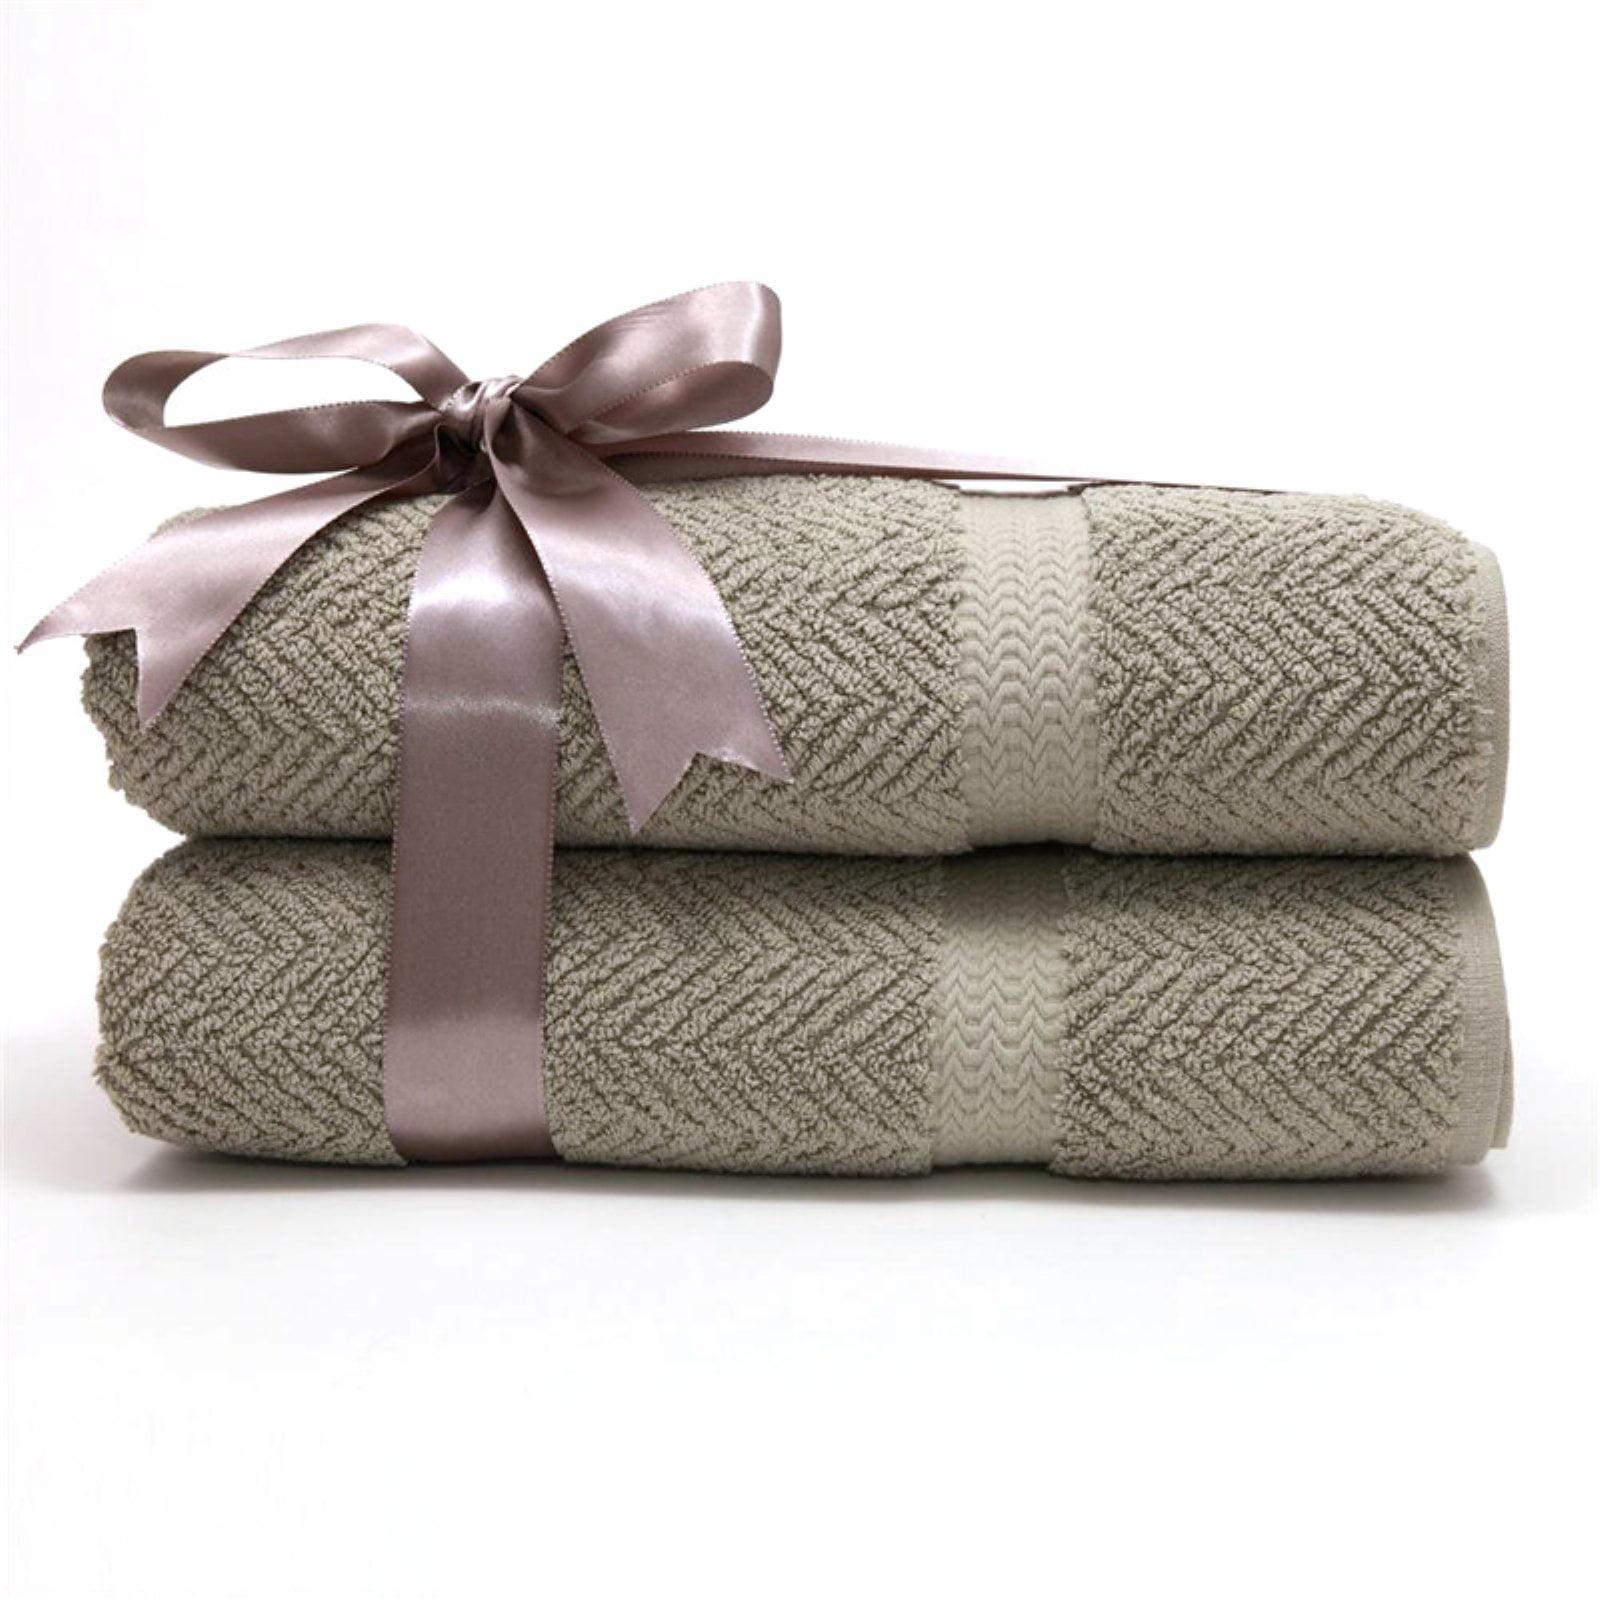 Linum Home Textiles Herringbone Bath Towel (Set of 2) by Overstock